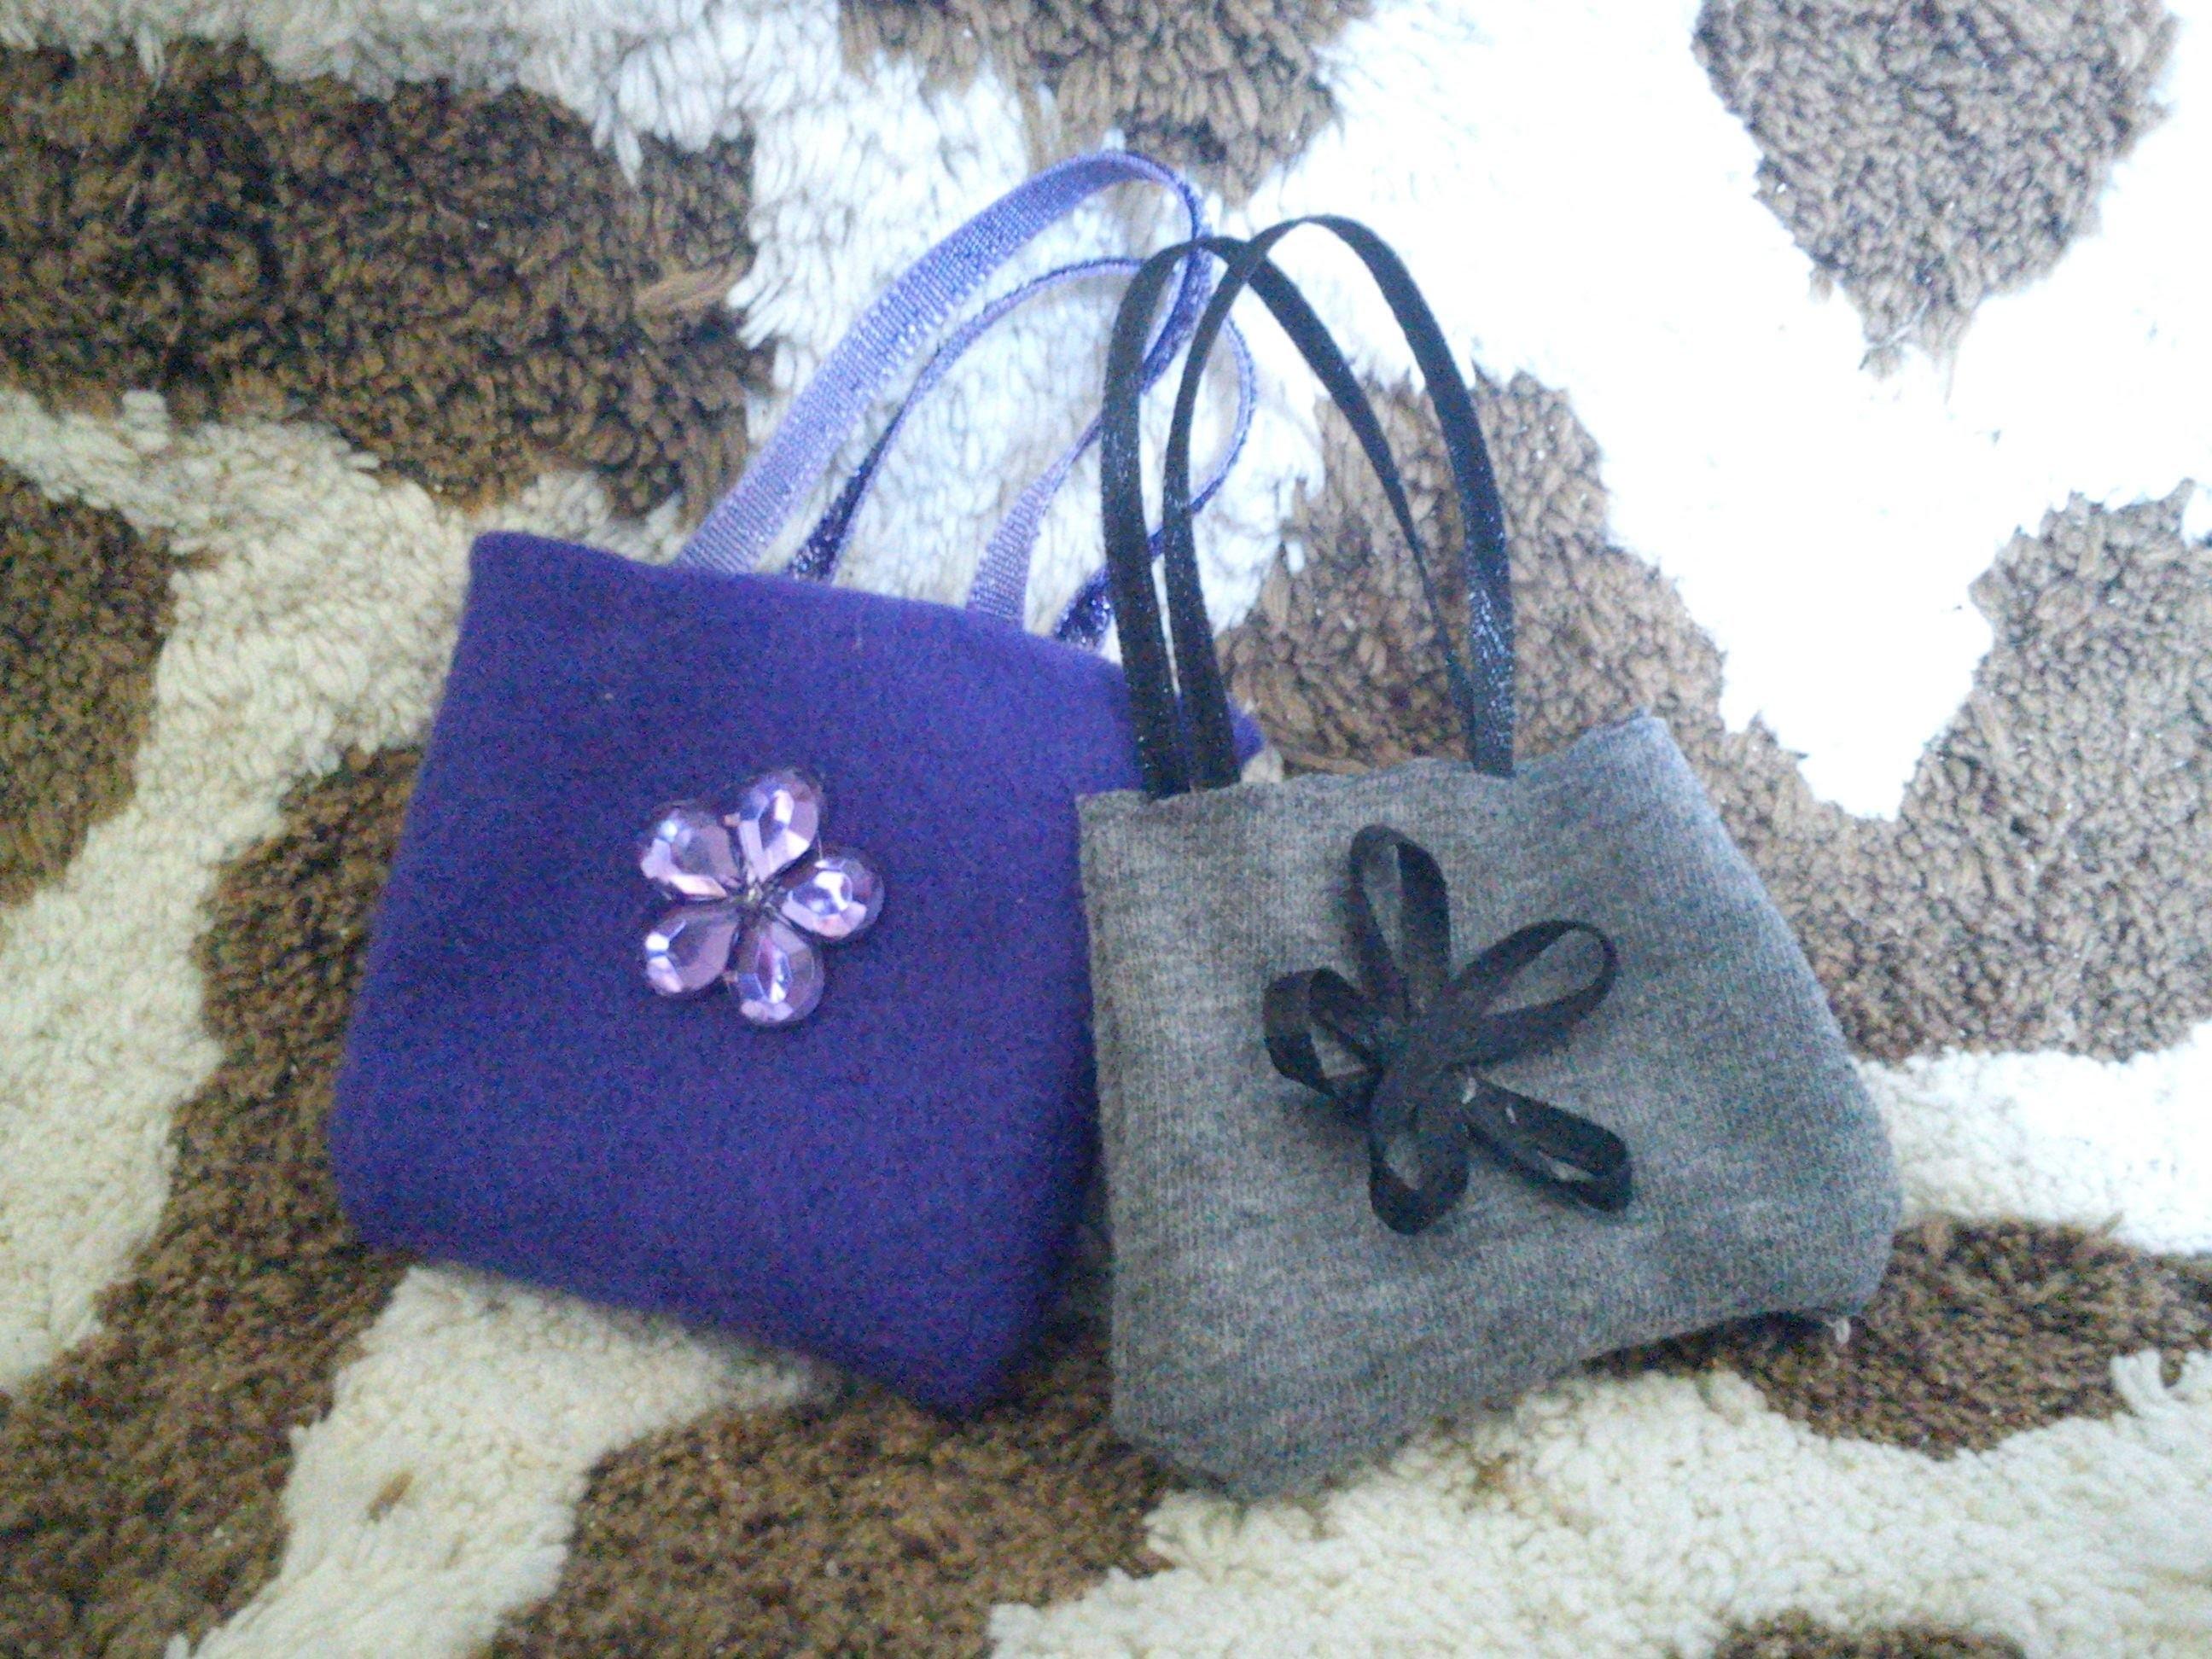 Doll Fashion: How To Make a Doll Purse. Handbag